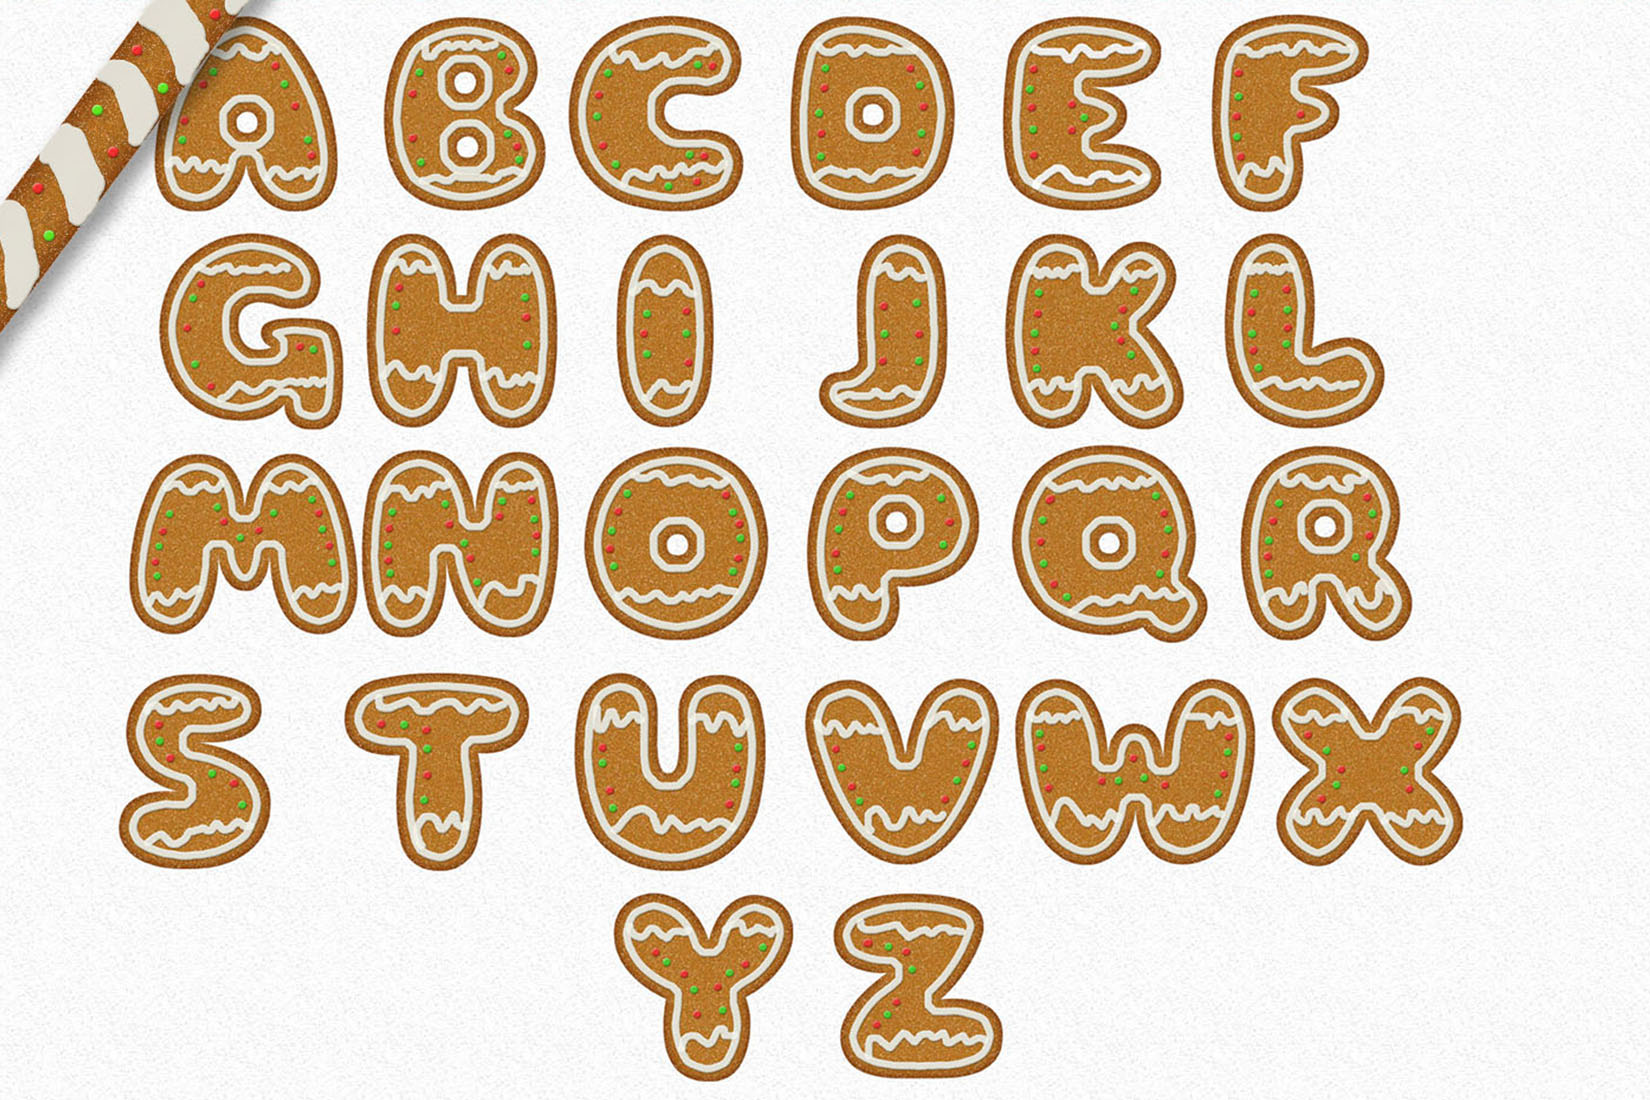 Gingerman Design Bundle - Letters, Numbers, Illustrations example image 5